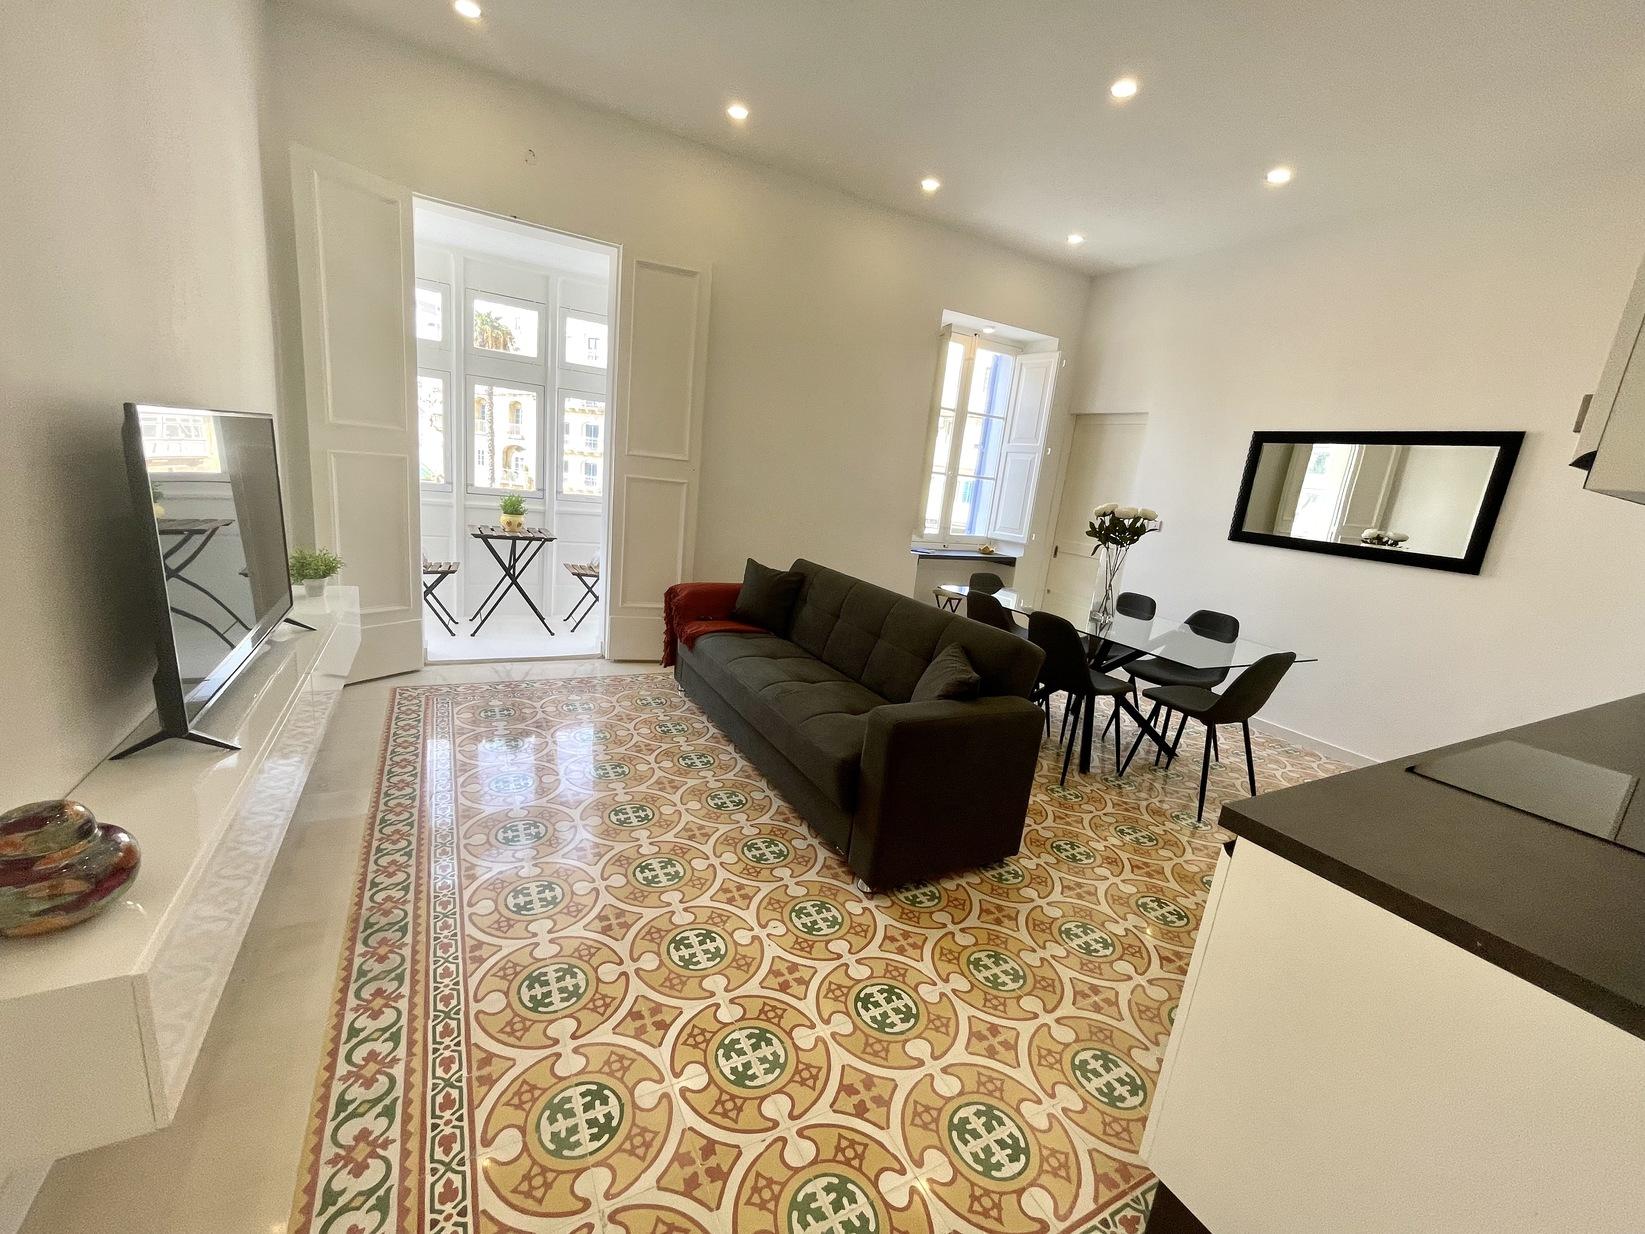 3 bed Town House For Rent in Kalkara, Kalkara - thumb 4